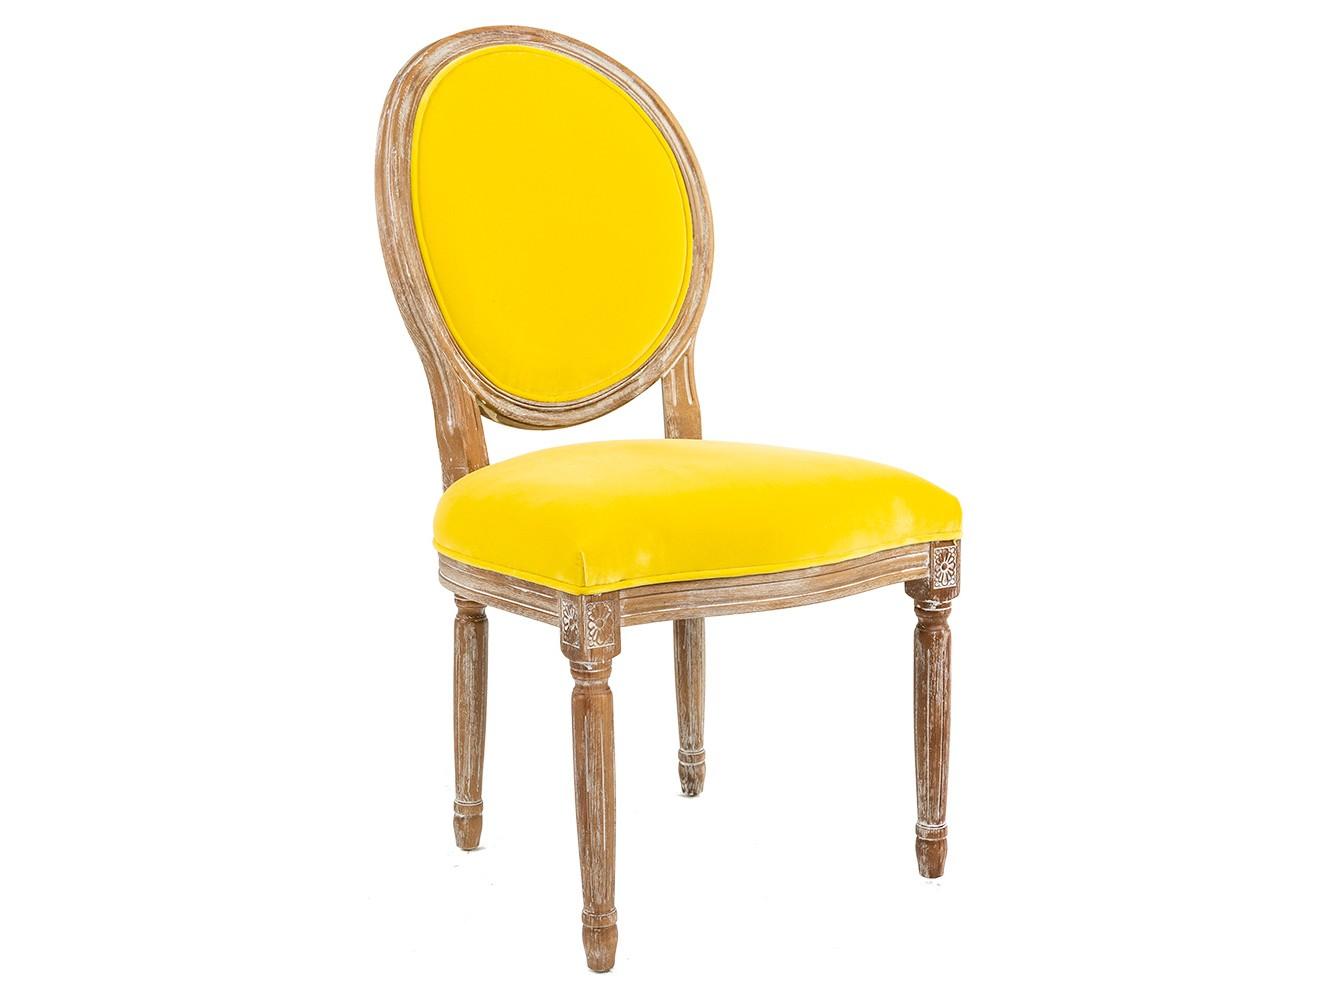 Кухонный стул Object Desire 15438273 от thefurnish